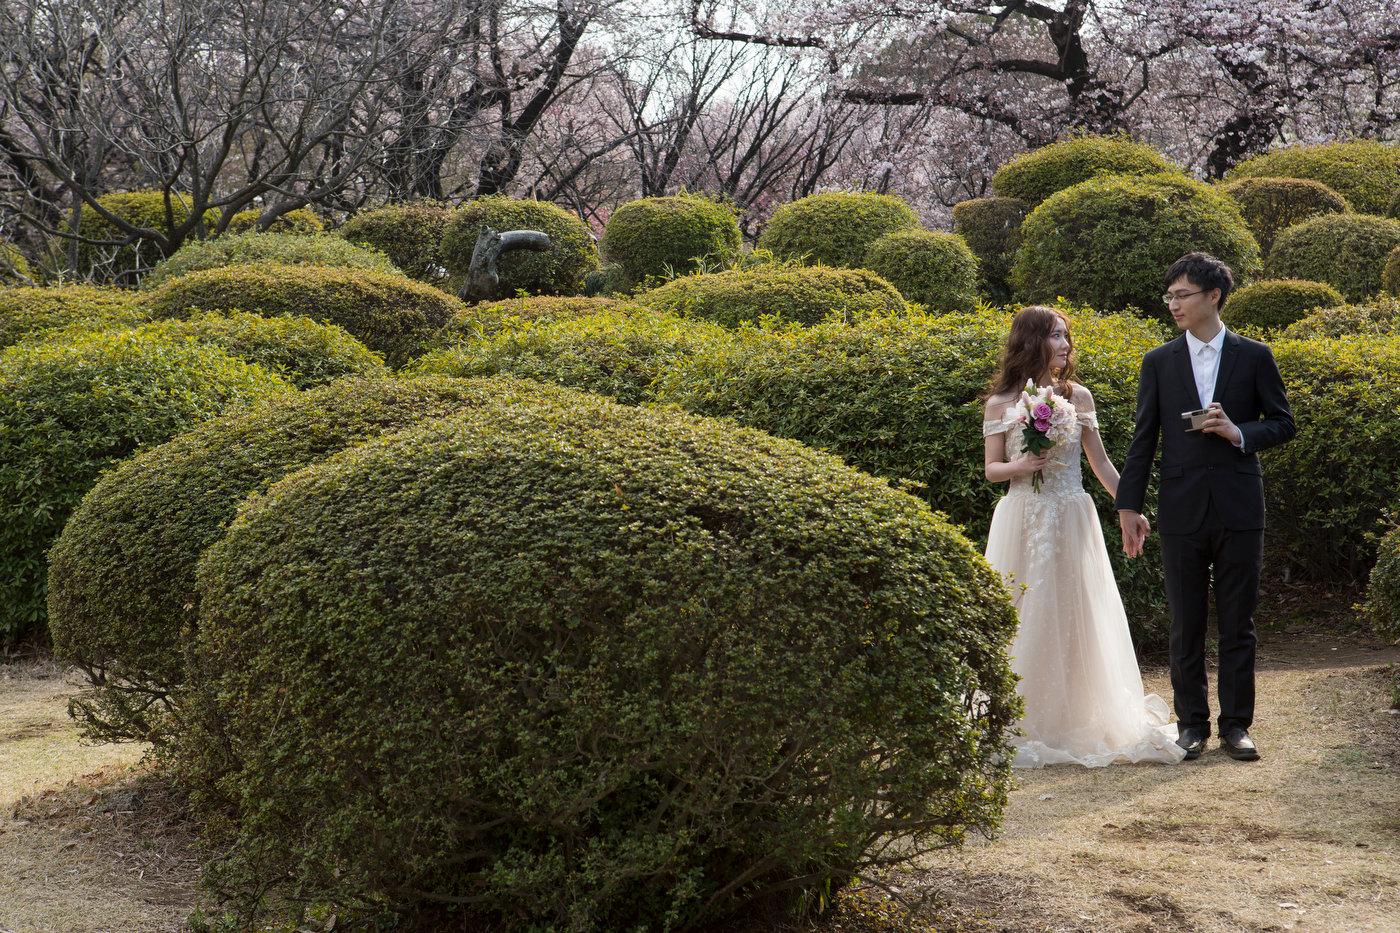 Western style wedding, Shinjuku Gyoen park.